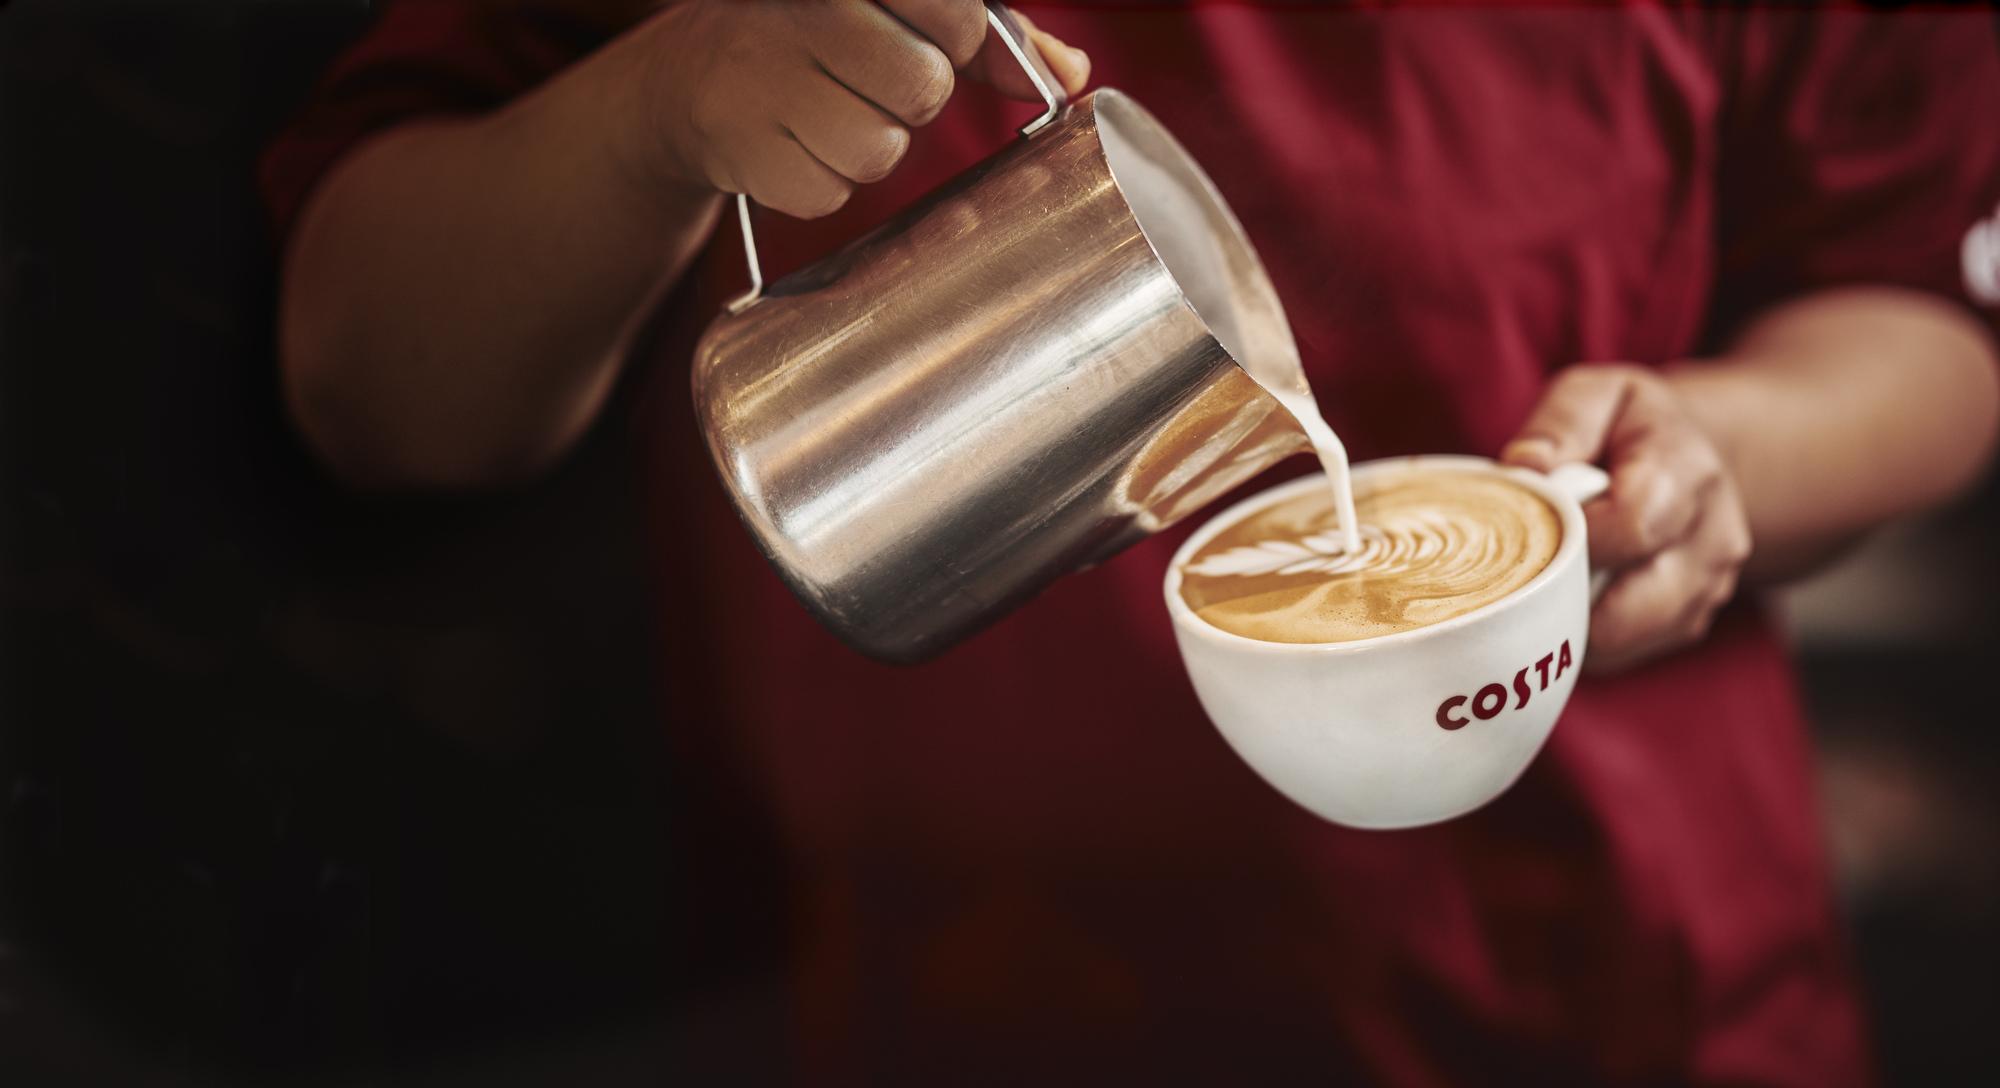 costa coffee natural reportage photographer natural lifestyle photography matthew lloyd 0067.JPG